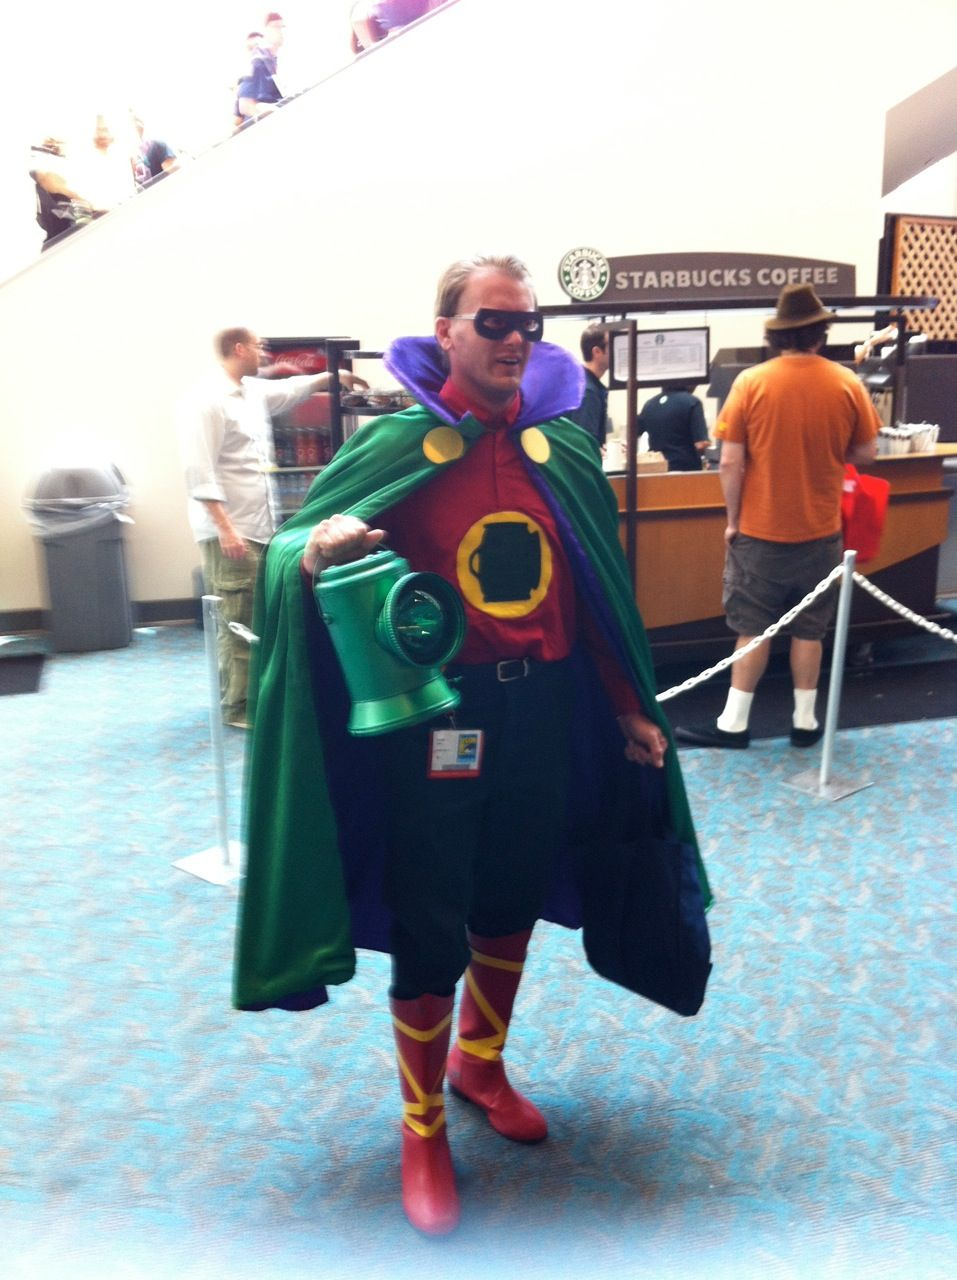 golden age Alan Scott Green Lantern cosplay from 2012 SDCC #cosplay #dccomics #greenlantern #alanscott